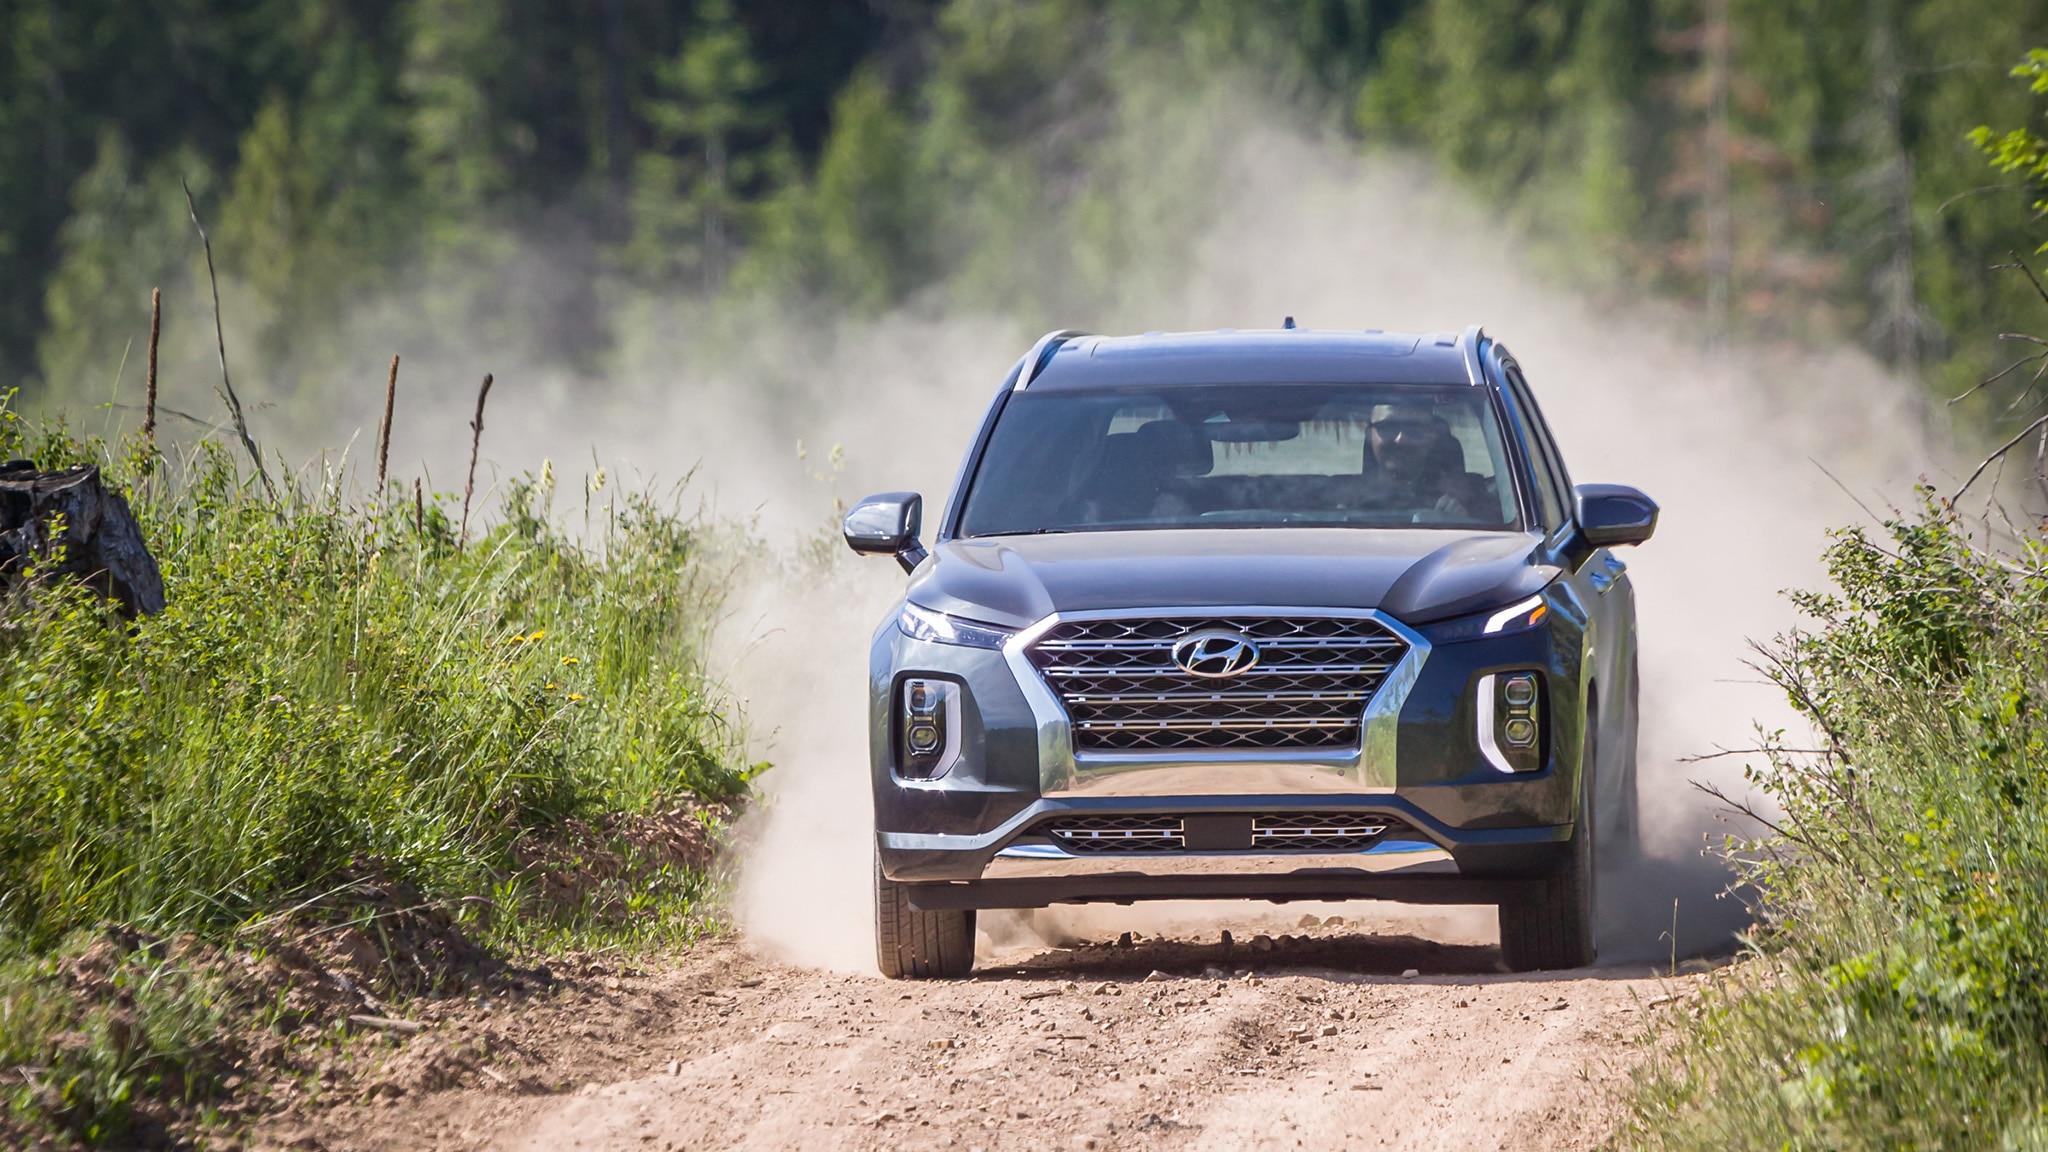 2020 Hyundai Palisade Uses Silence, Luxury Against Explorer and